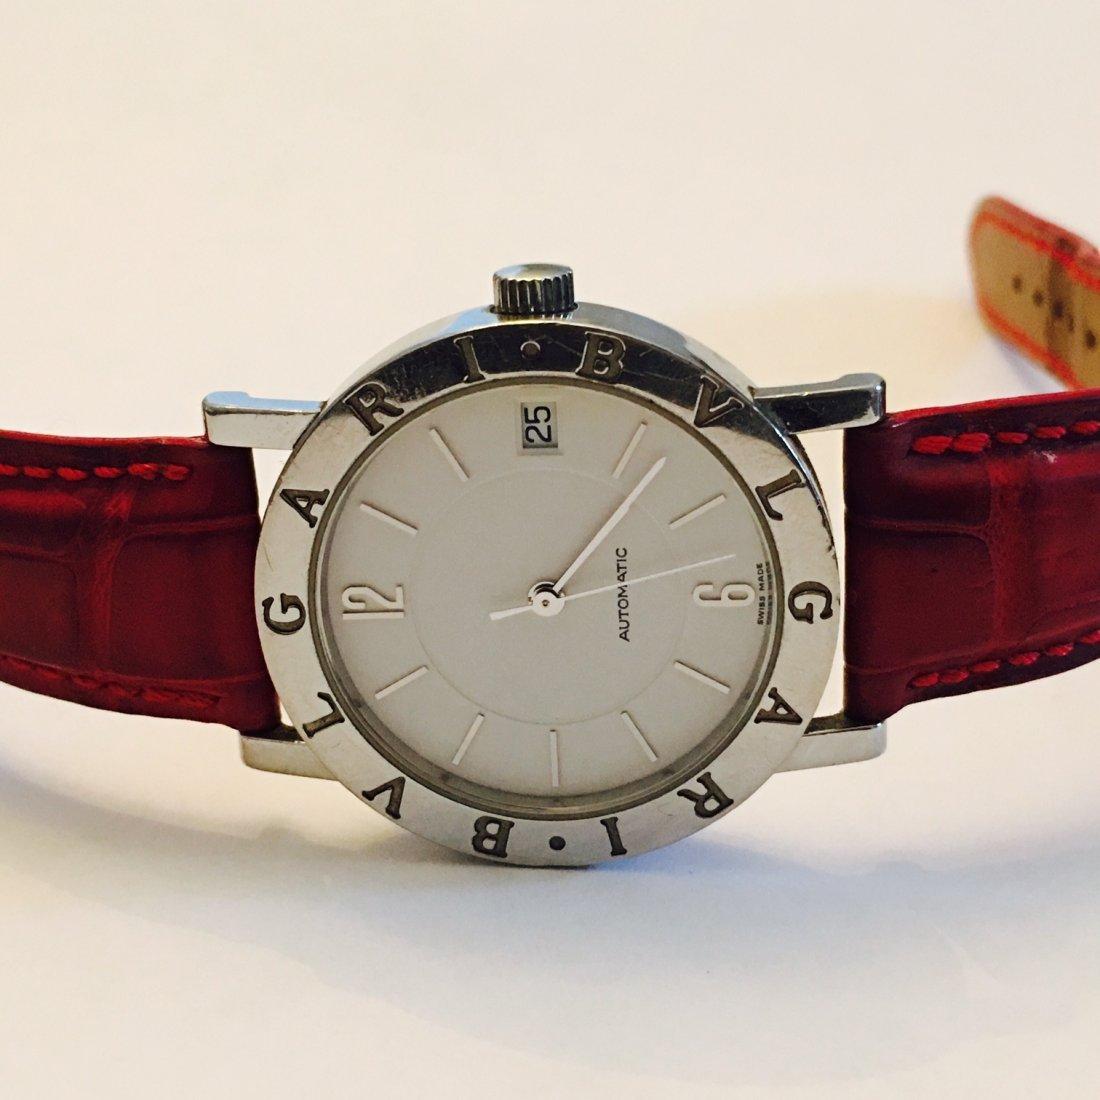 BVLGARI Watch with Crimson Leather Belt